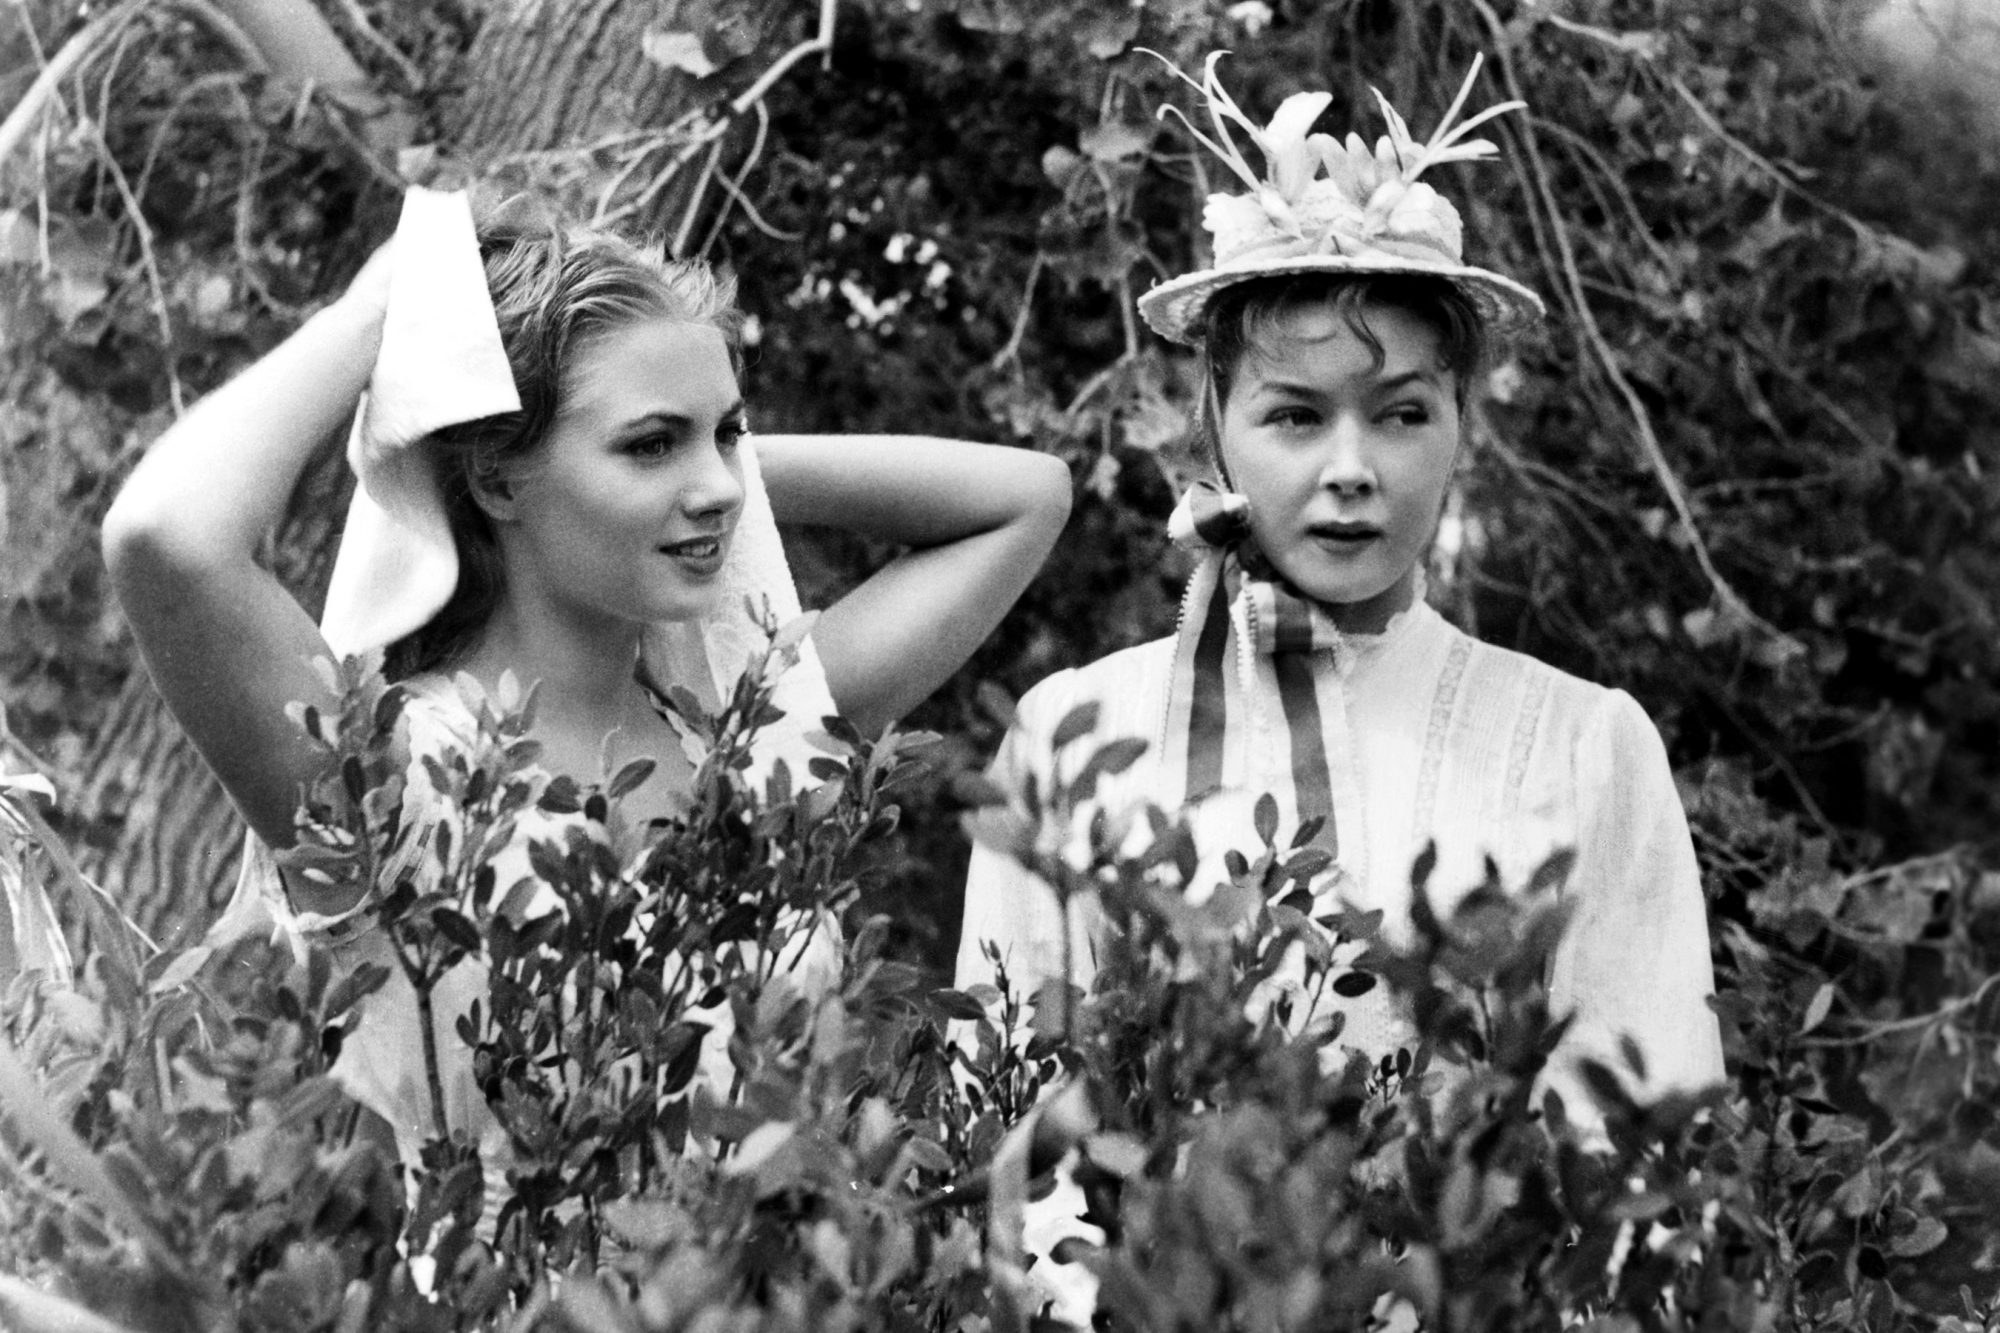 OKLAHOMA!, from left, Shirley Jones, Gloria Grahame, 1955, ©20th Century Fox Film Corporation, TM &